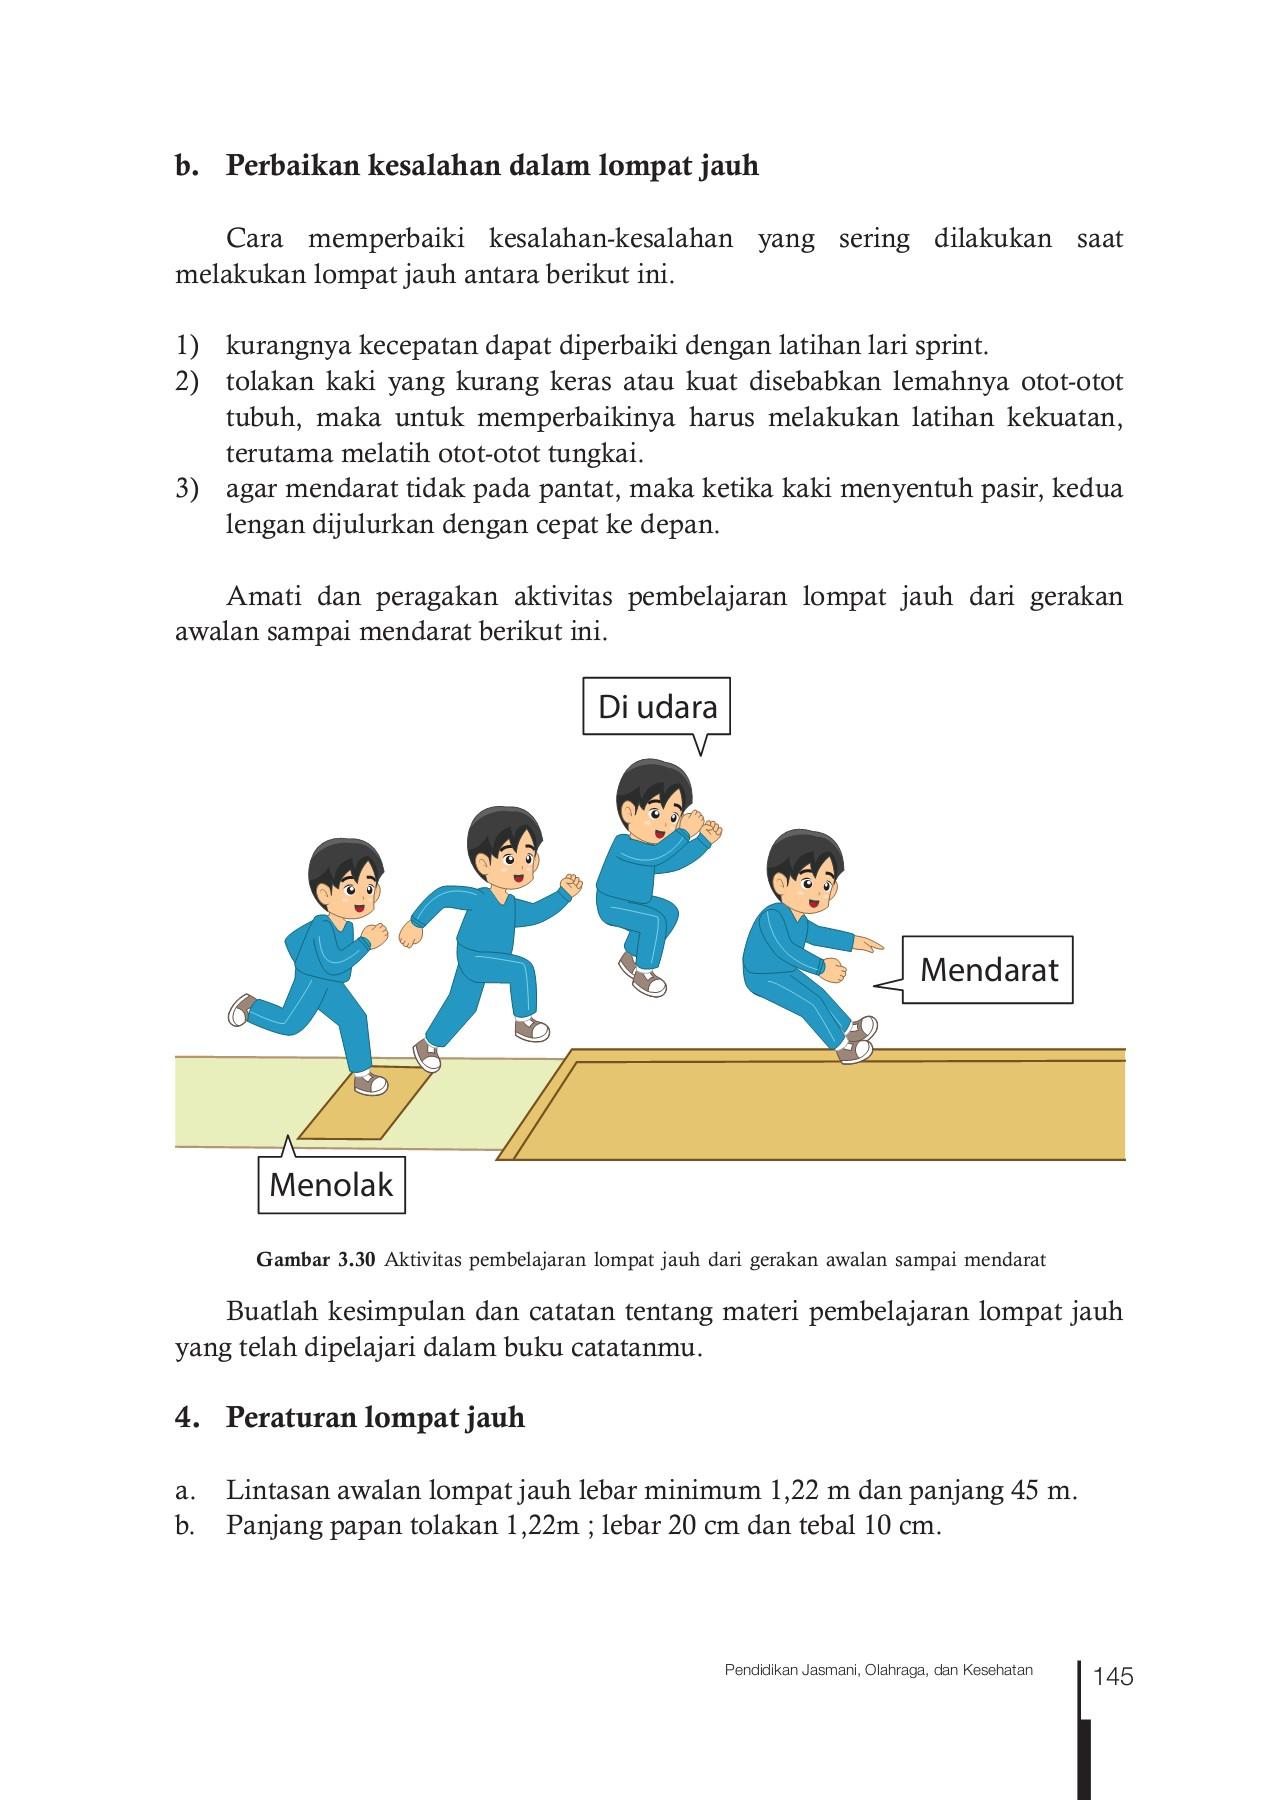 Panjang Lintasan Lompat Jauh : panjang, lintasan, lompat, Kelas, Pendidikan, Jasmani, Olahraga, Kesehatan, Siswa, Pages, Download, FlipHTML5